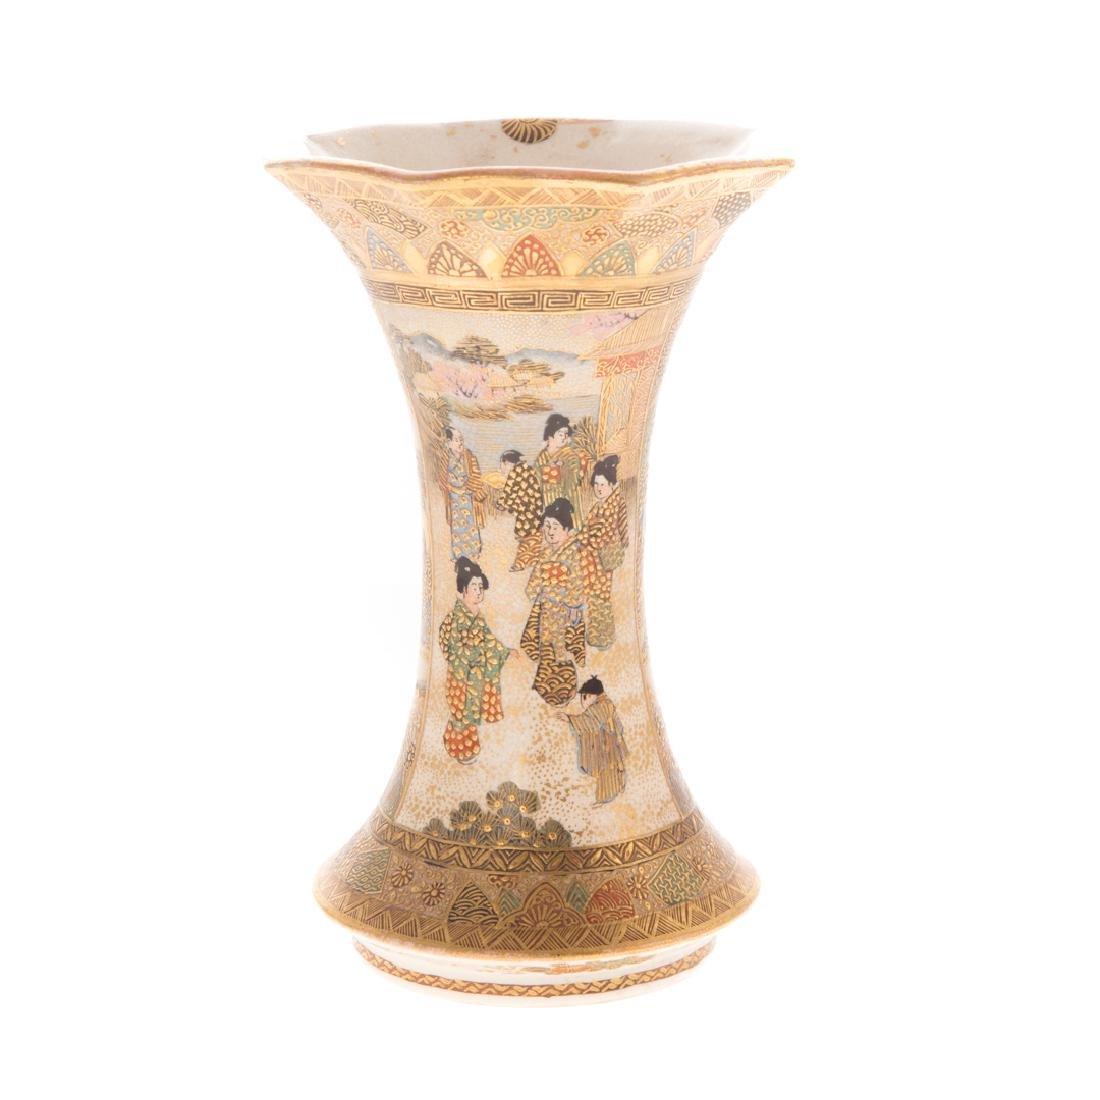 Two Japanese Satsuma miniature trumpet vases